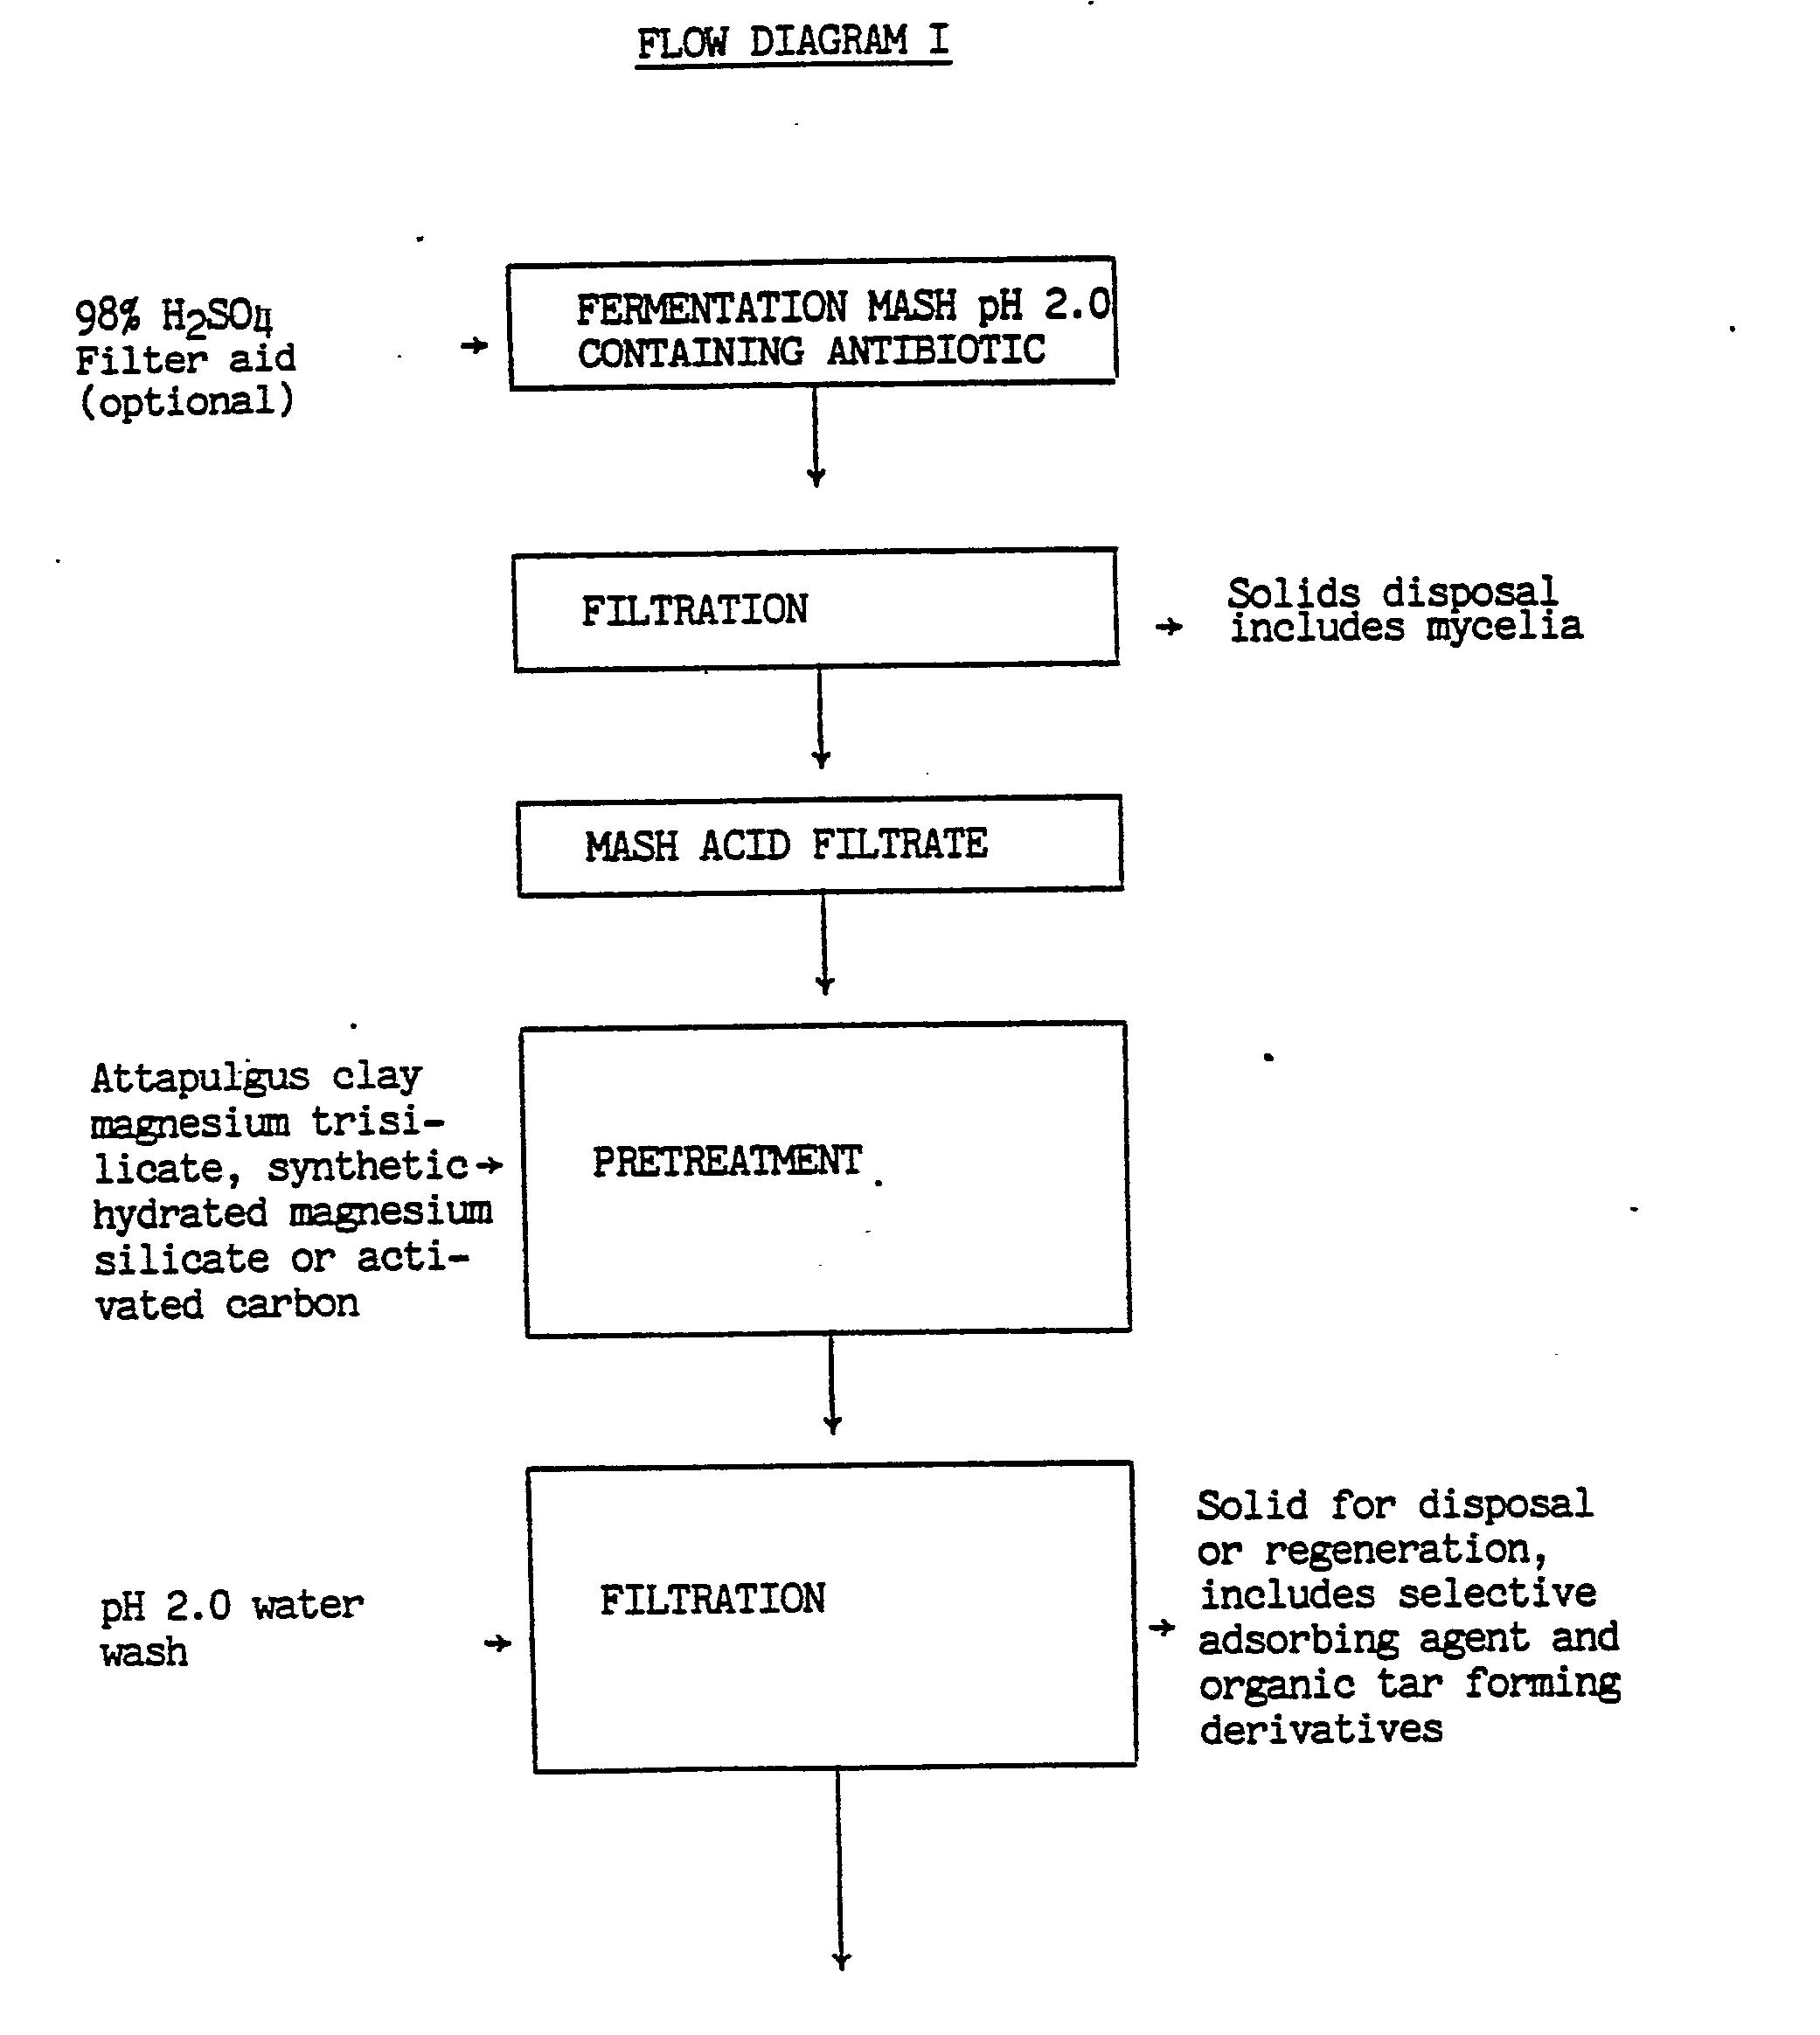 clarion vx401 wiring diagram dometic rm2611 nz500 megasquirt 2